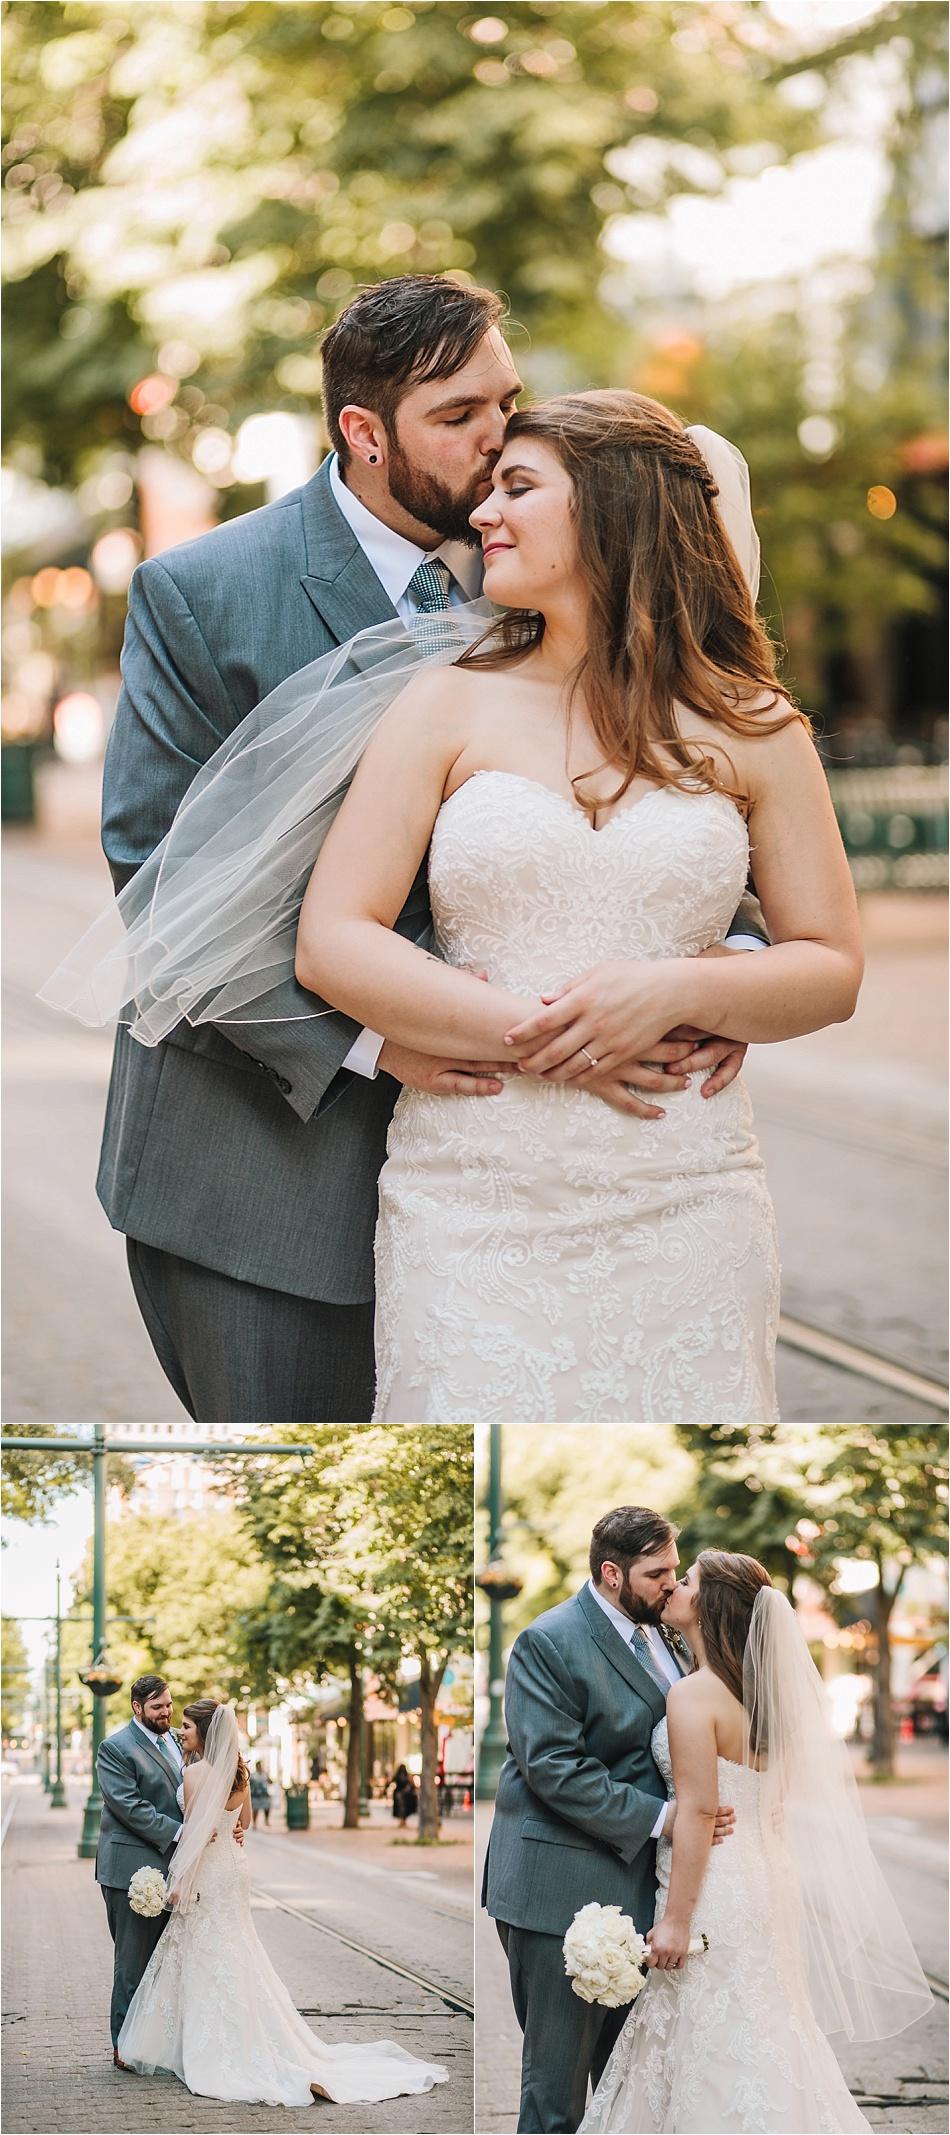 CK-Photo-Nashville-Wedding-Photographer-_0016.jpg